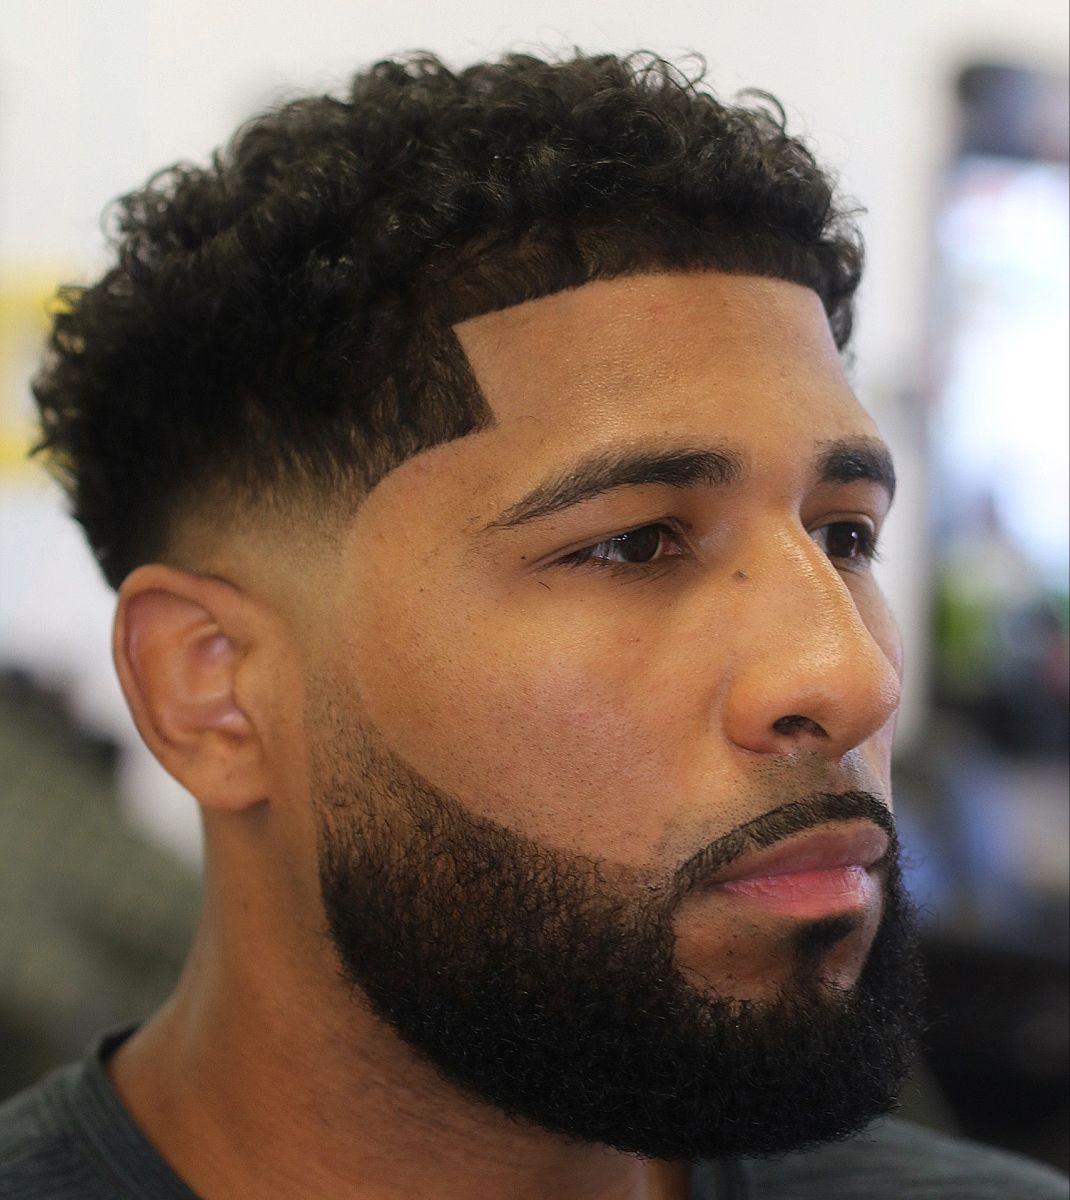 Paul George Fade Man Bun Curly Hair Taper Fade Haircut Low Fade Haircut